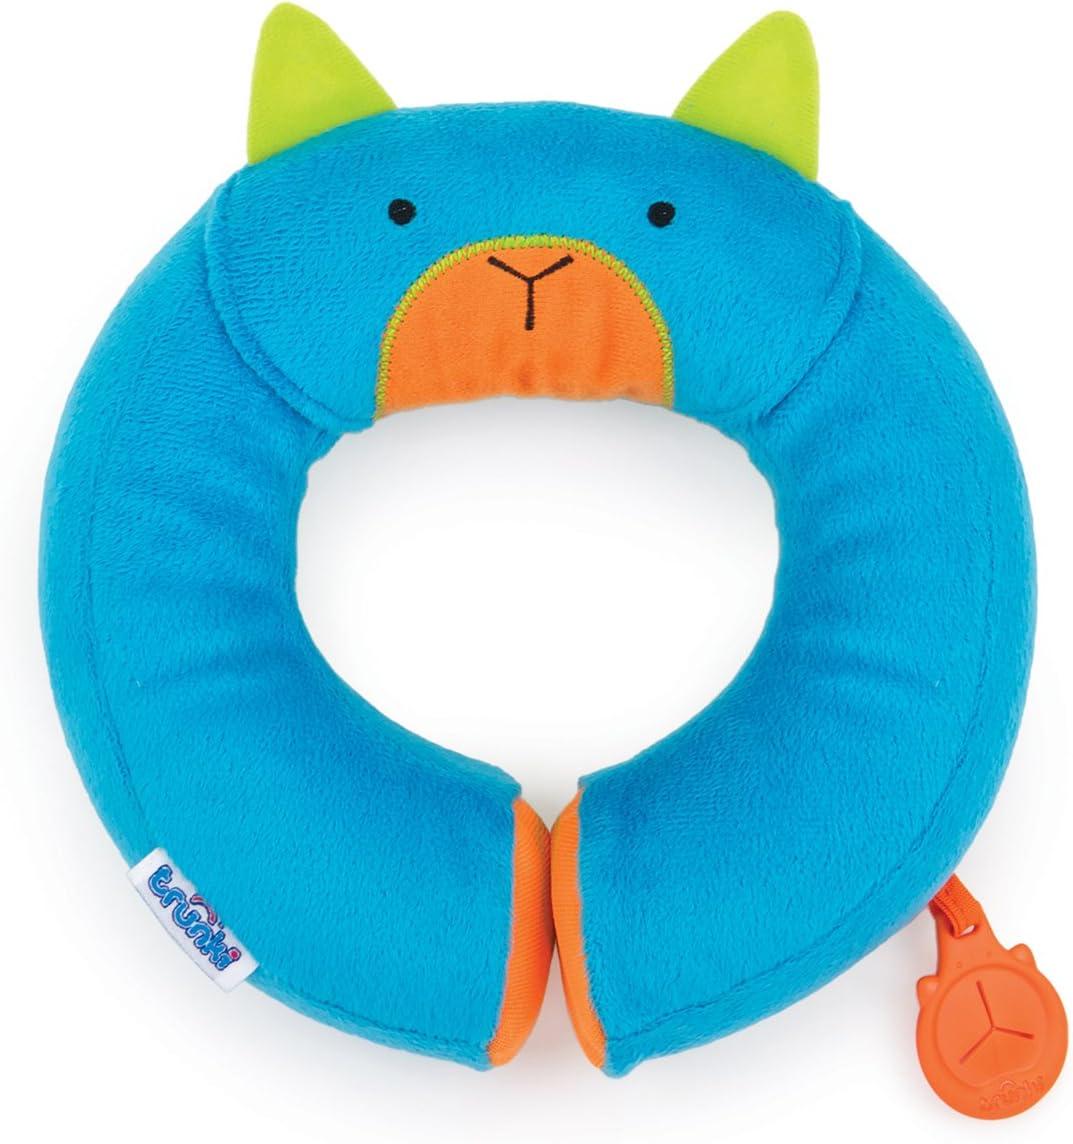 Trunki Almohadilla infantil de viaje - Yondi PEQUEÑO Bert (Azul)